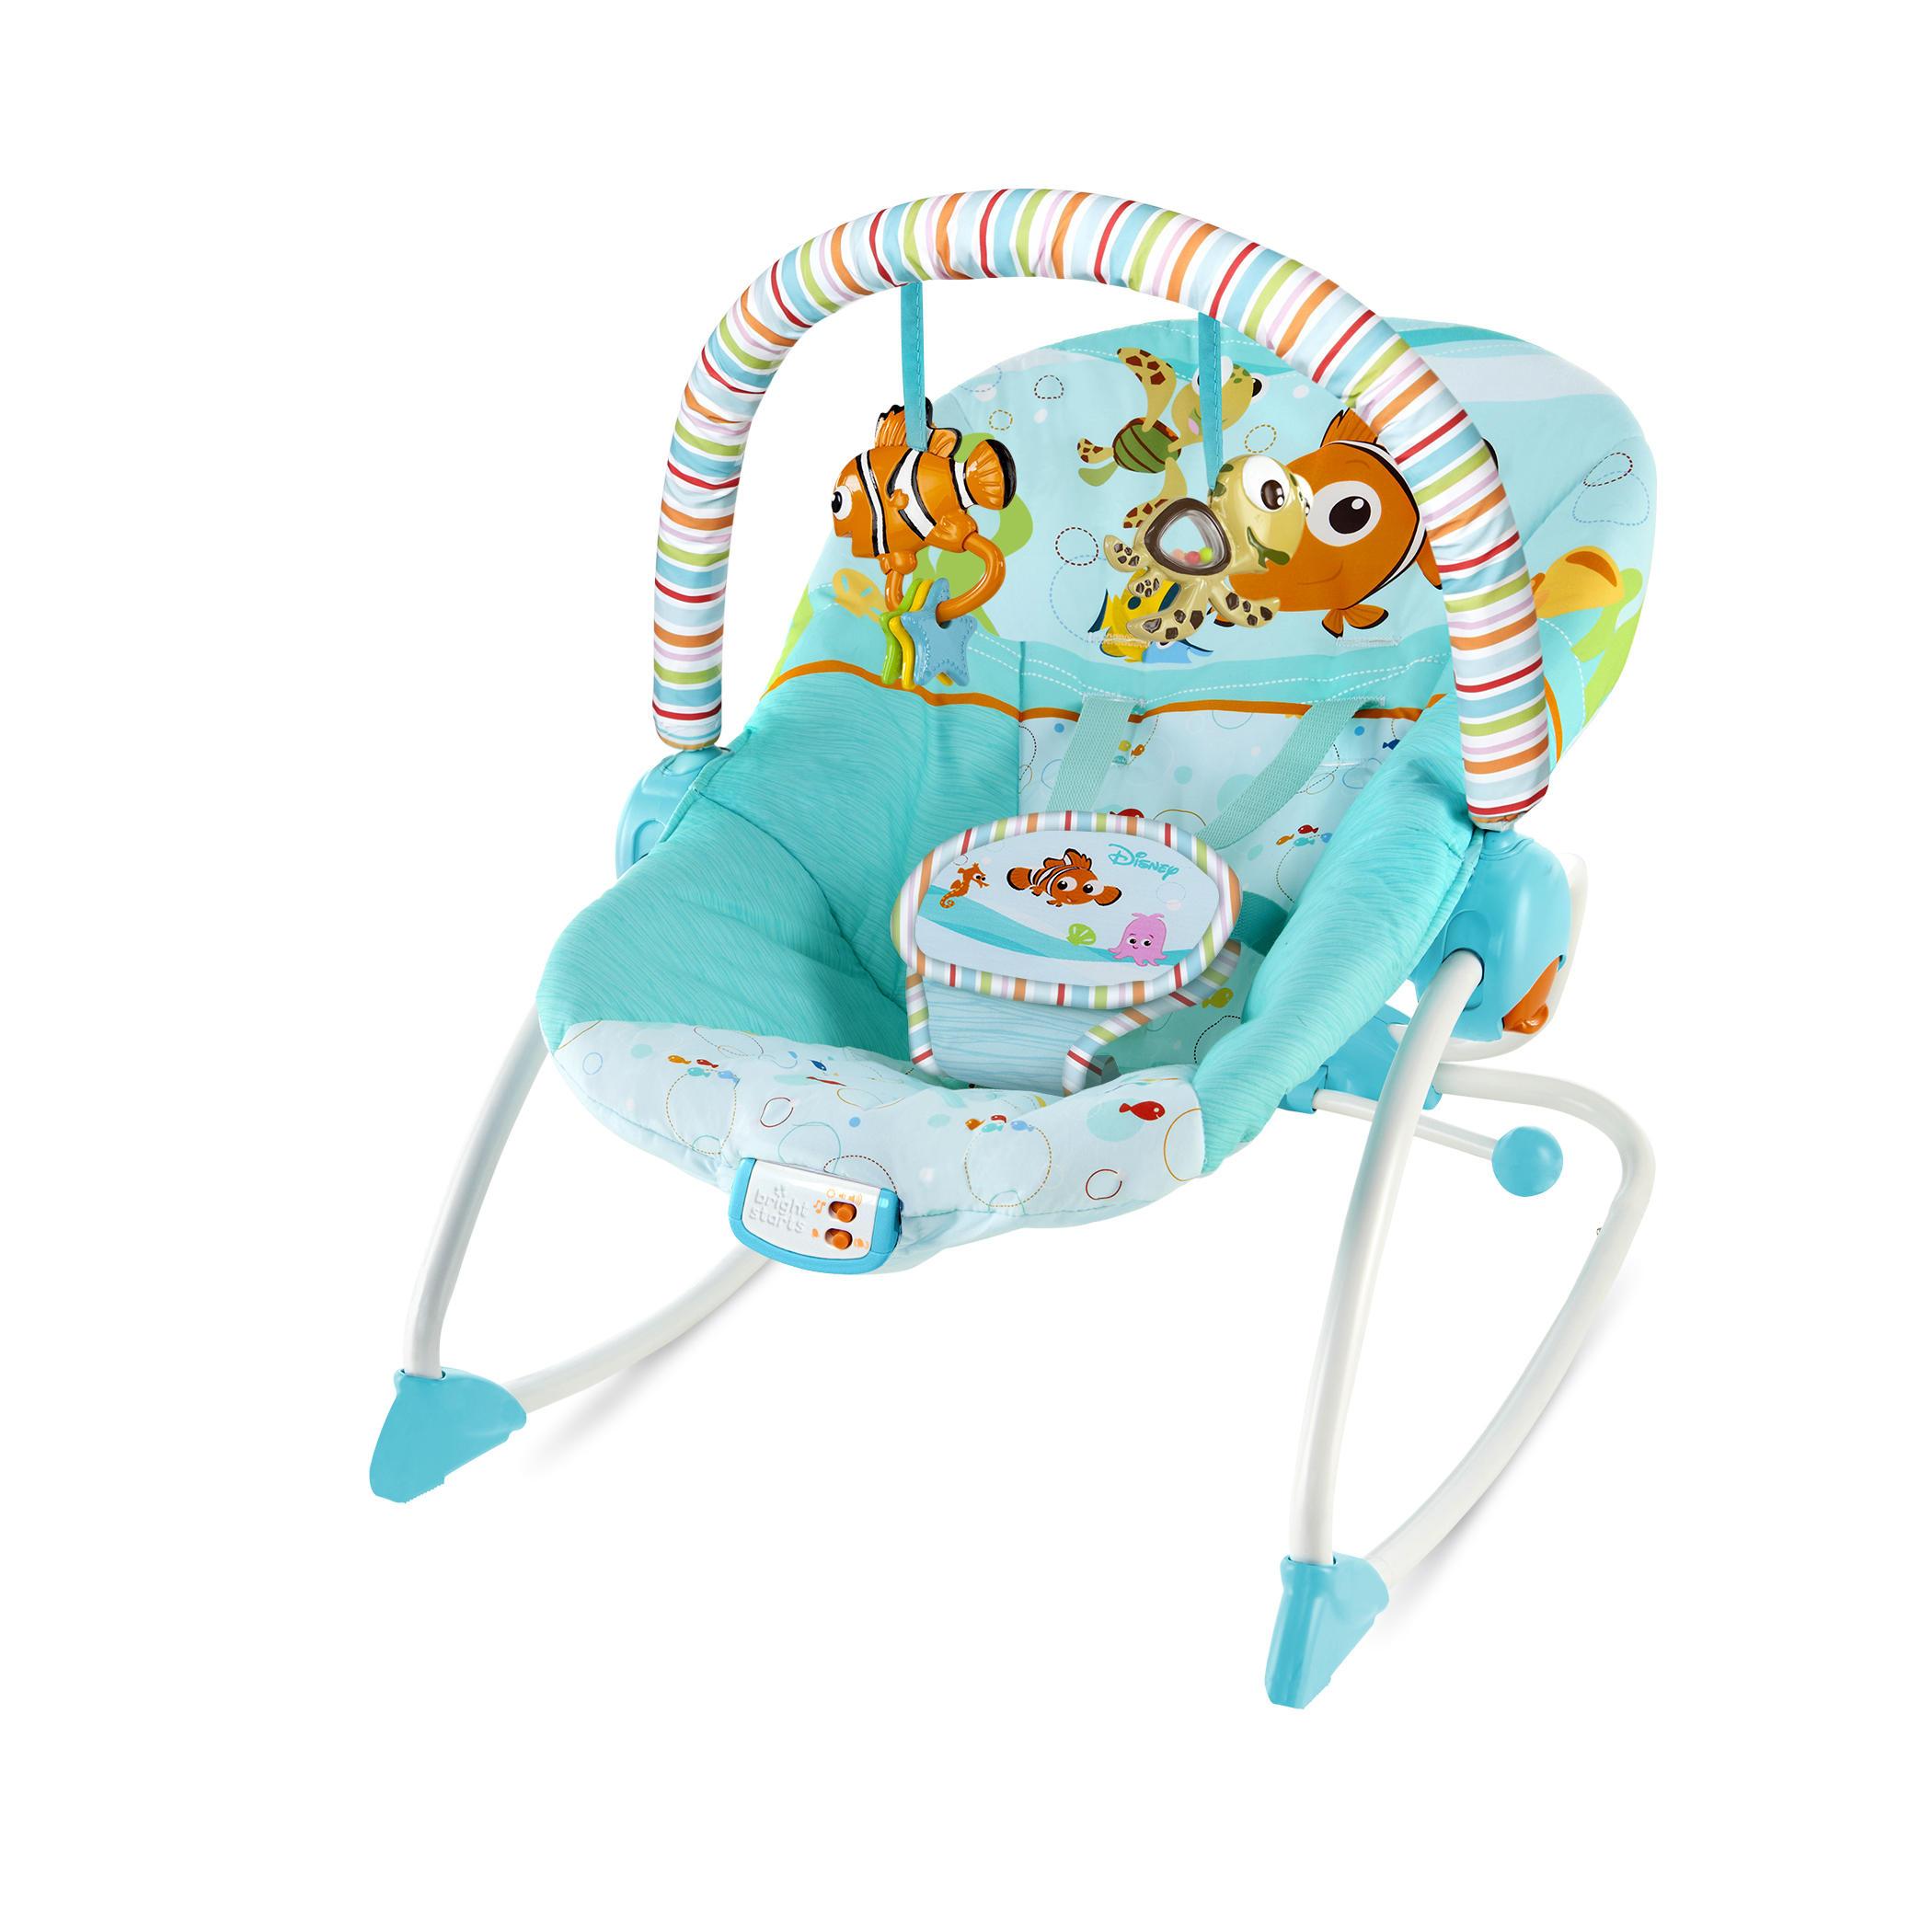 FINDING NEMO Fins & Friends Infant to Toddler Rocker™